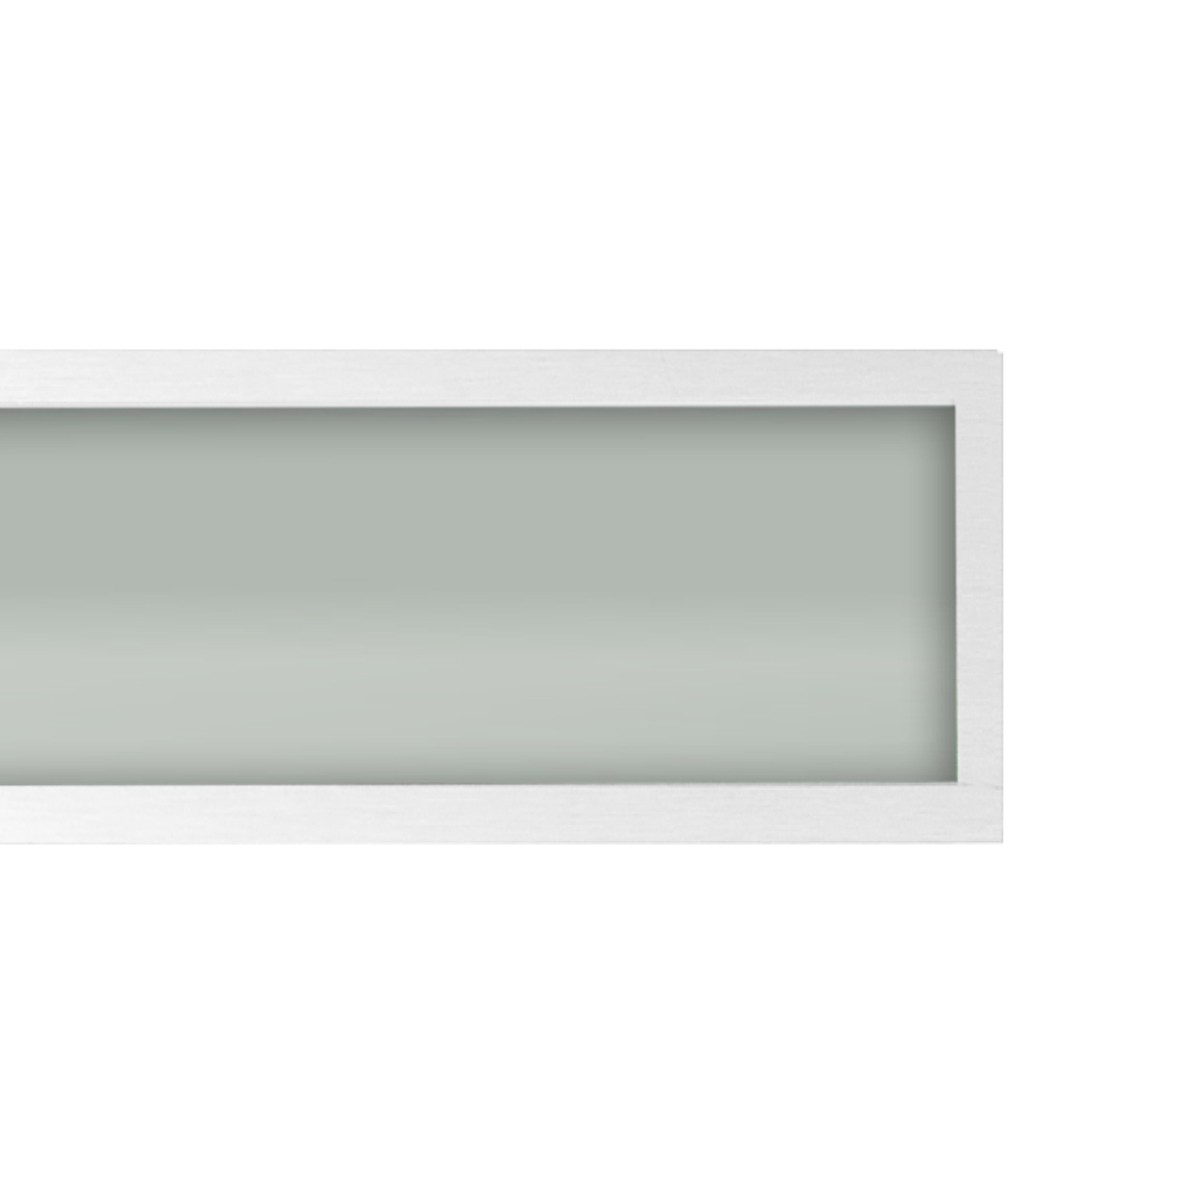 Plafon Space Sobr. Ret.   35cm Alum. Vidro Fosco E-27 2 Lamp. Max 60w Branco Kit 05 Unidades